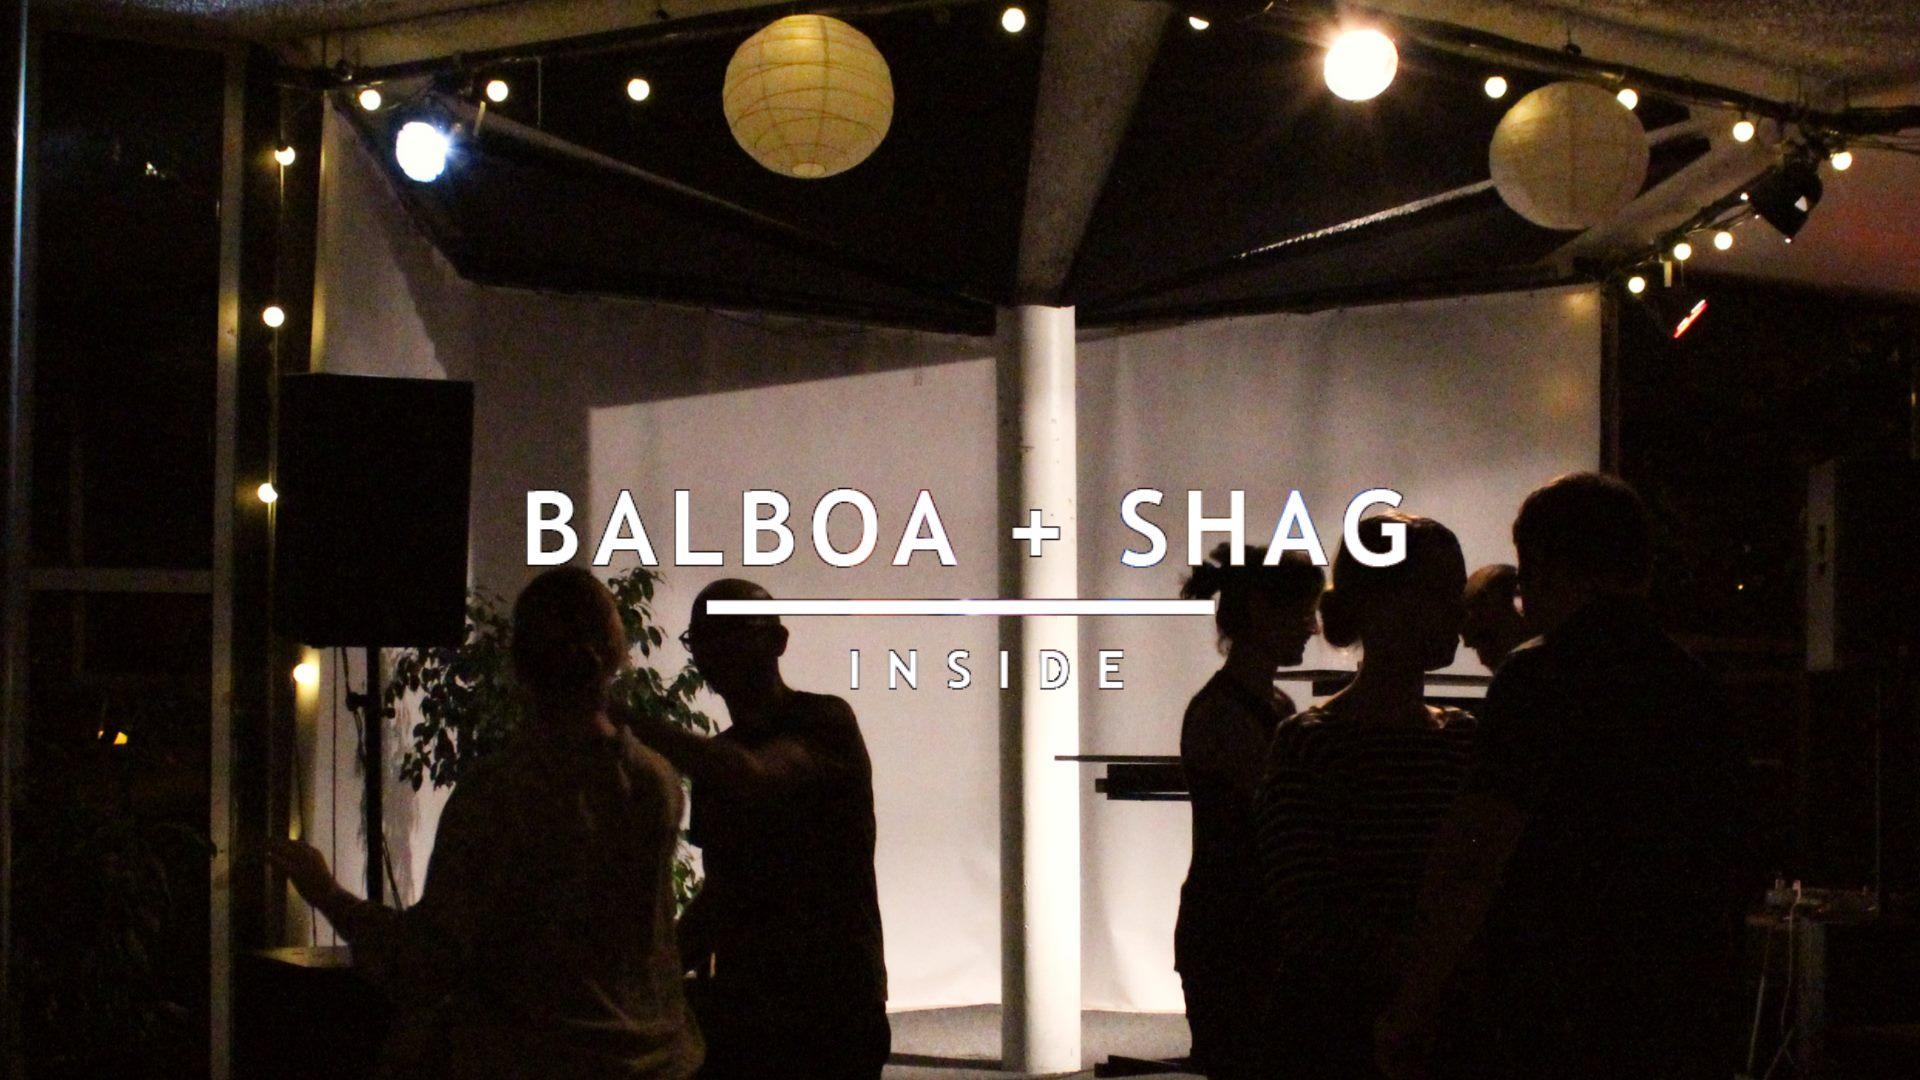 Balboa + Shag inside